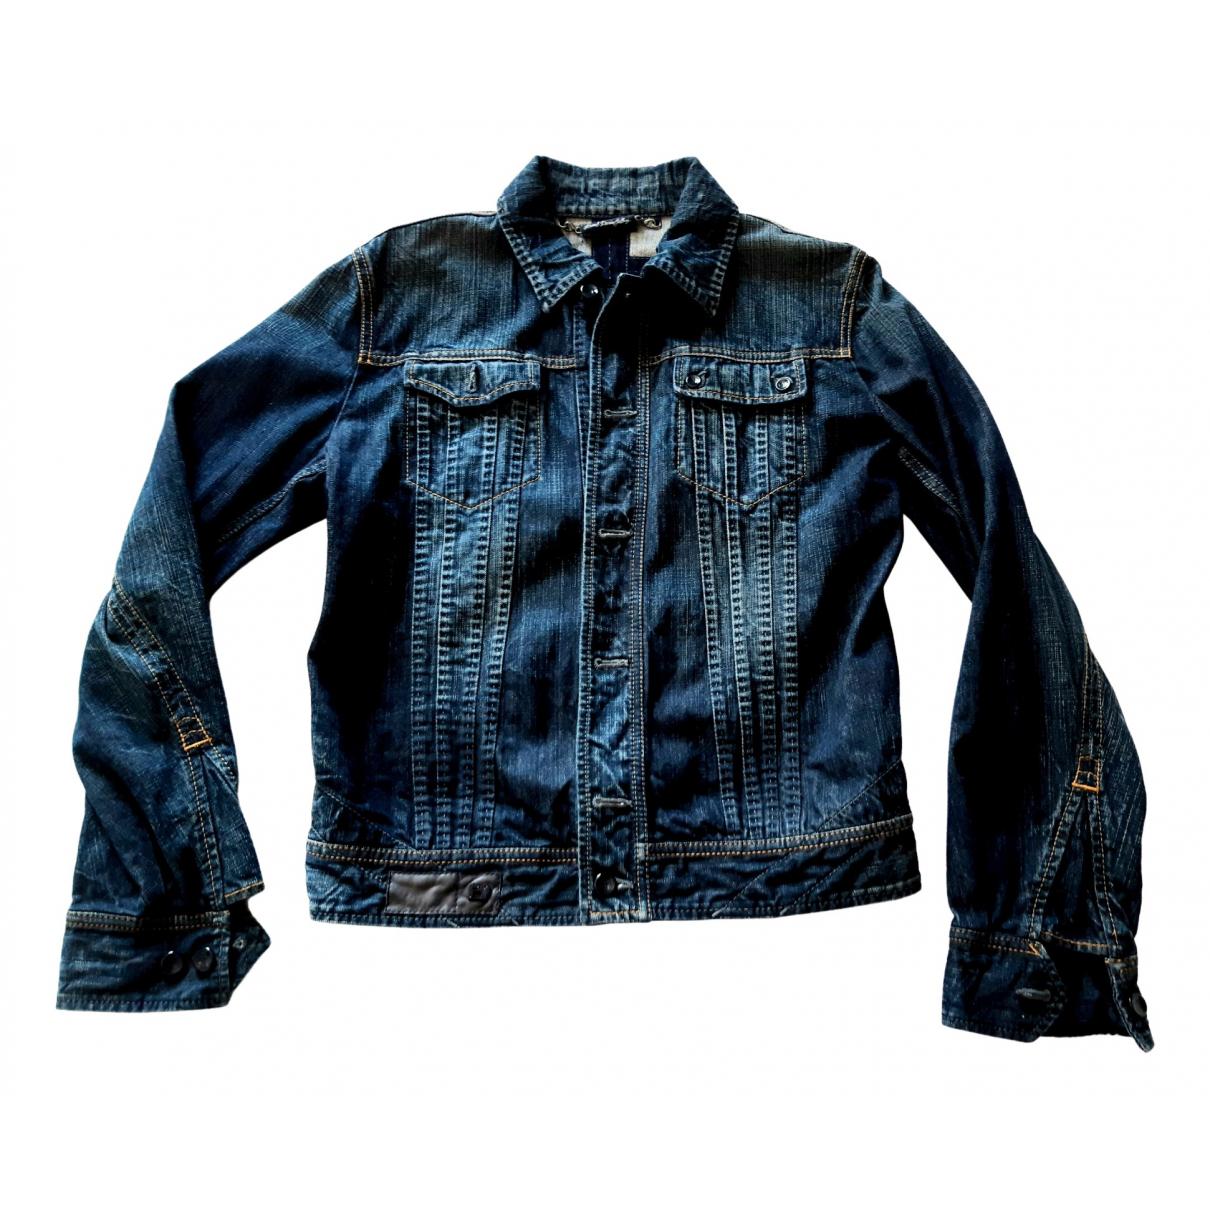 Diesel \N Blue Denim - Jeans jacket  for Men M International